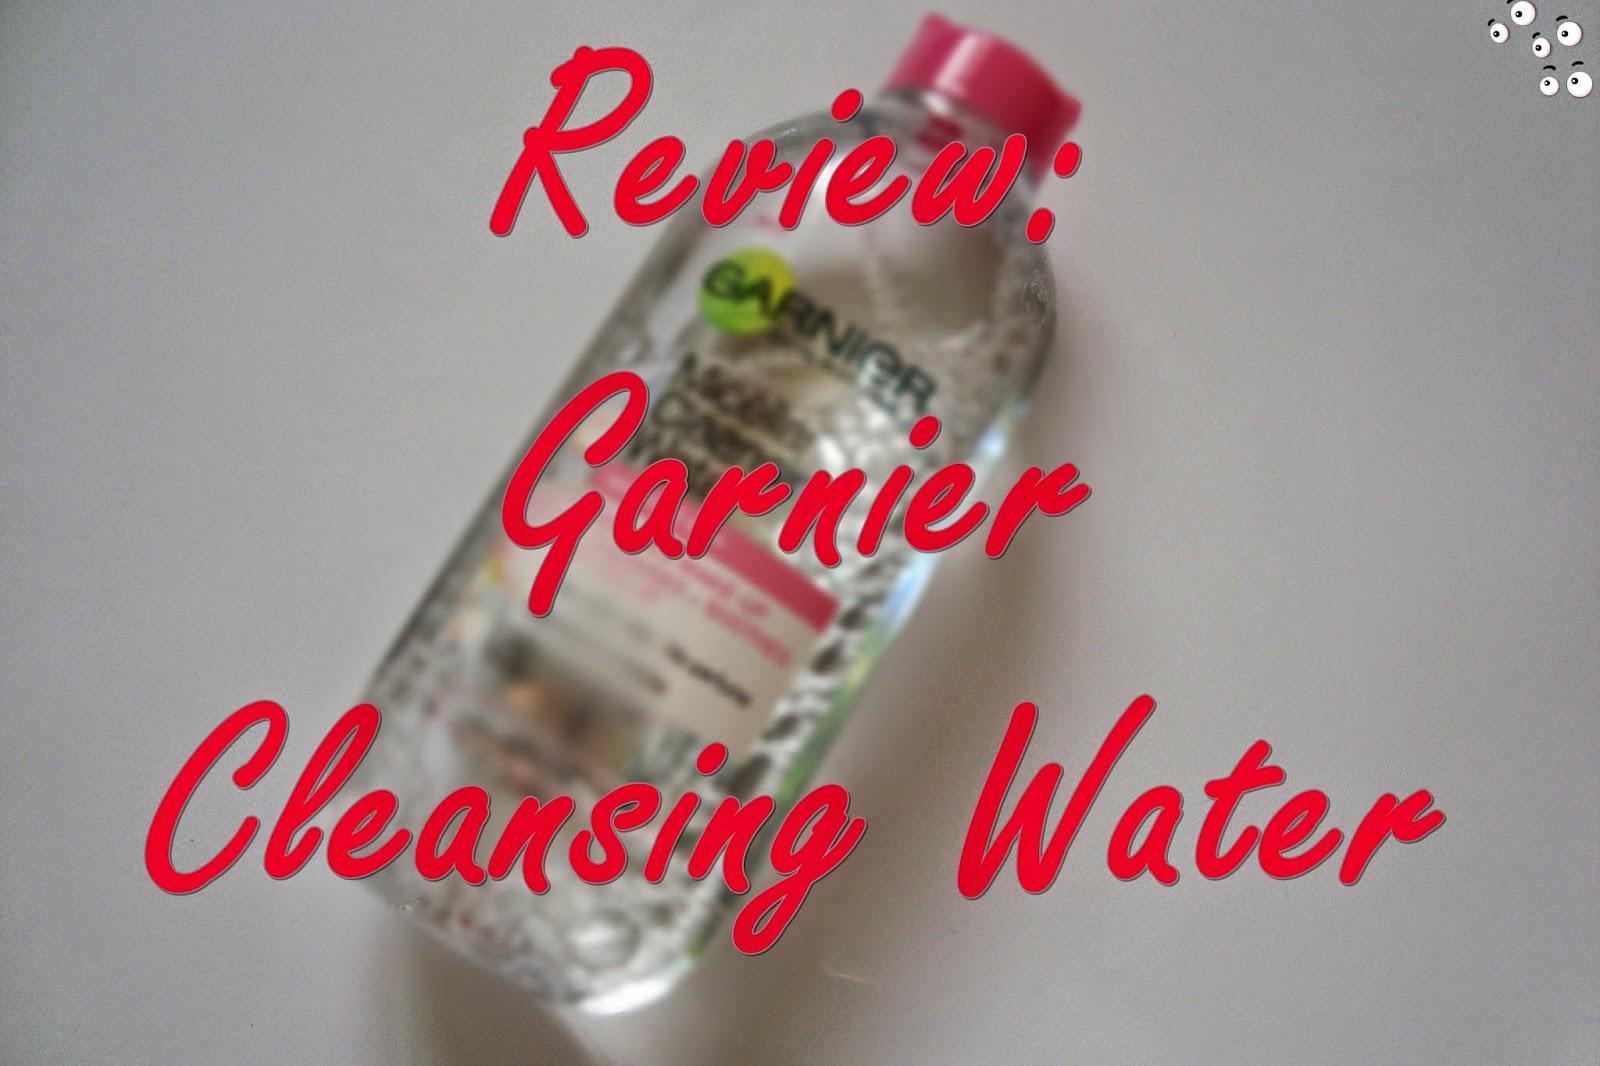 Garnier Cleansing Water review